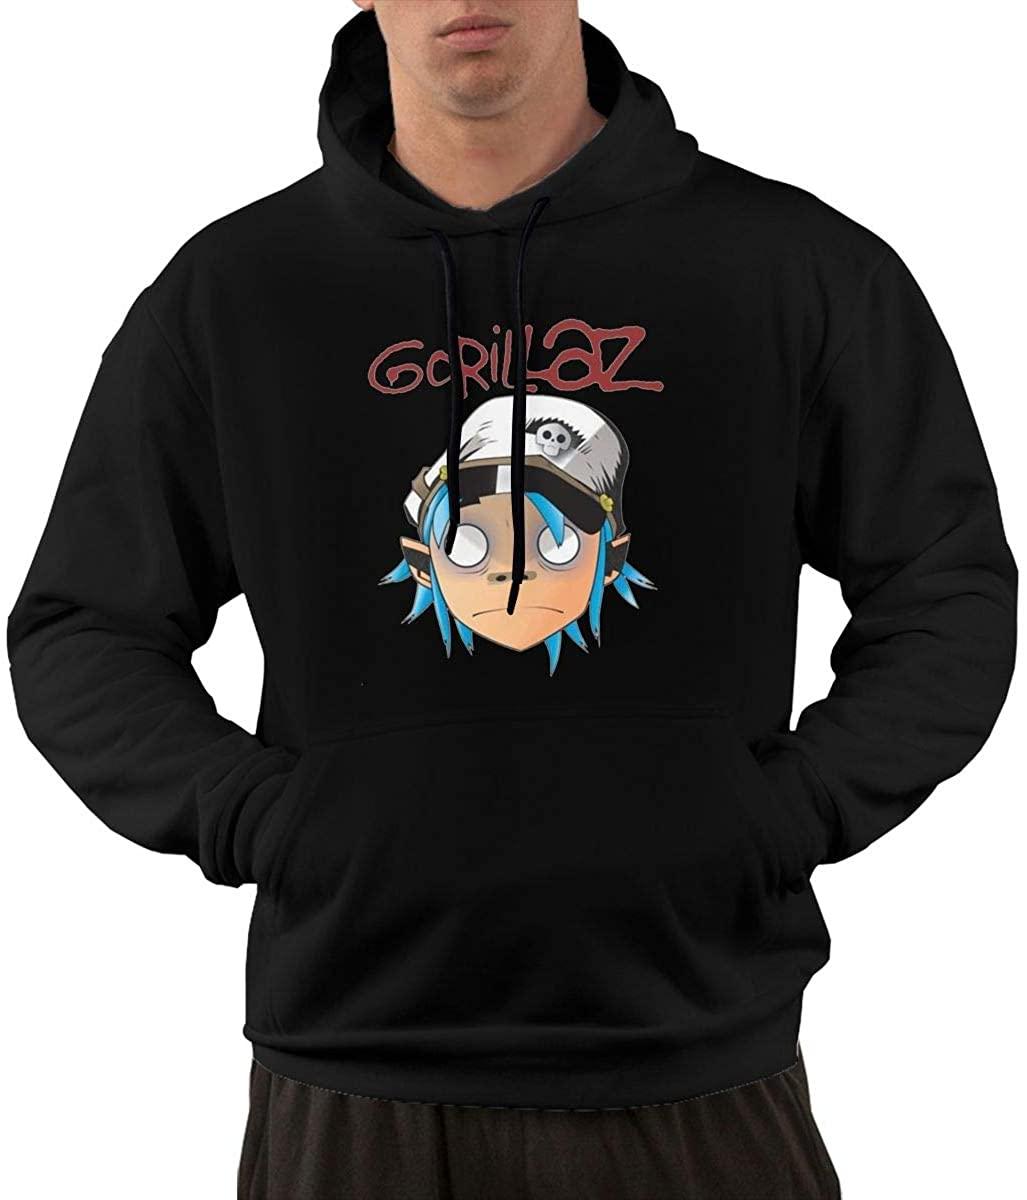 BRADLEY BOWEN Men's Gorillaz Crew Neck Personality Sweatshirt with Pocket